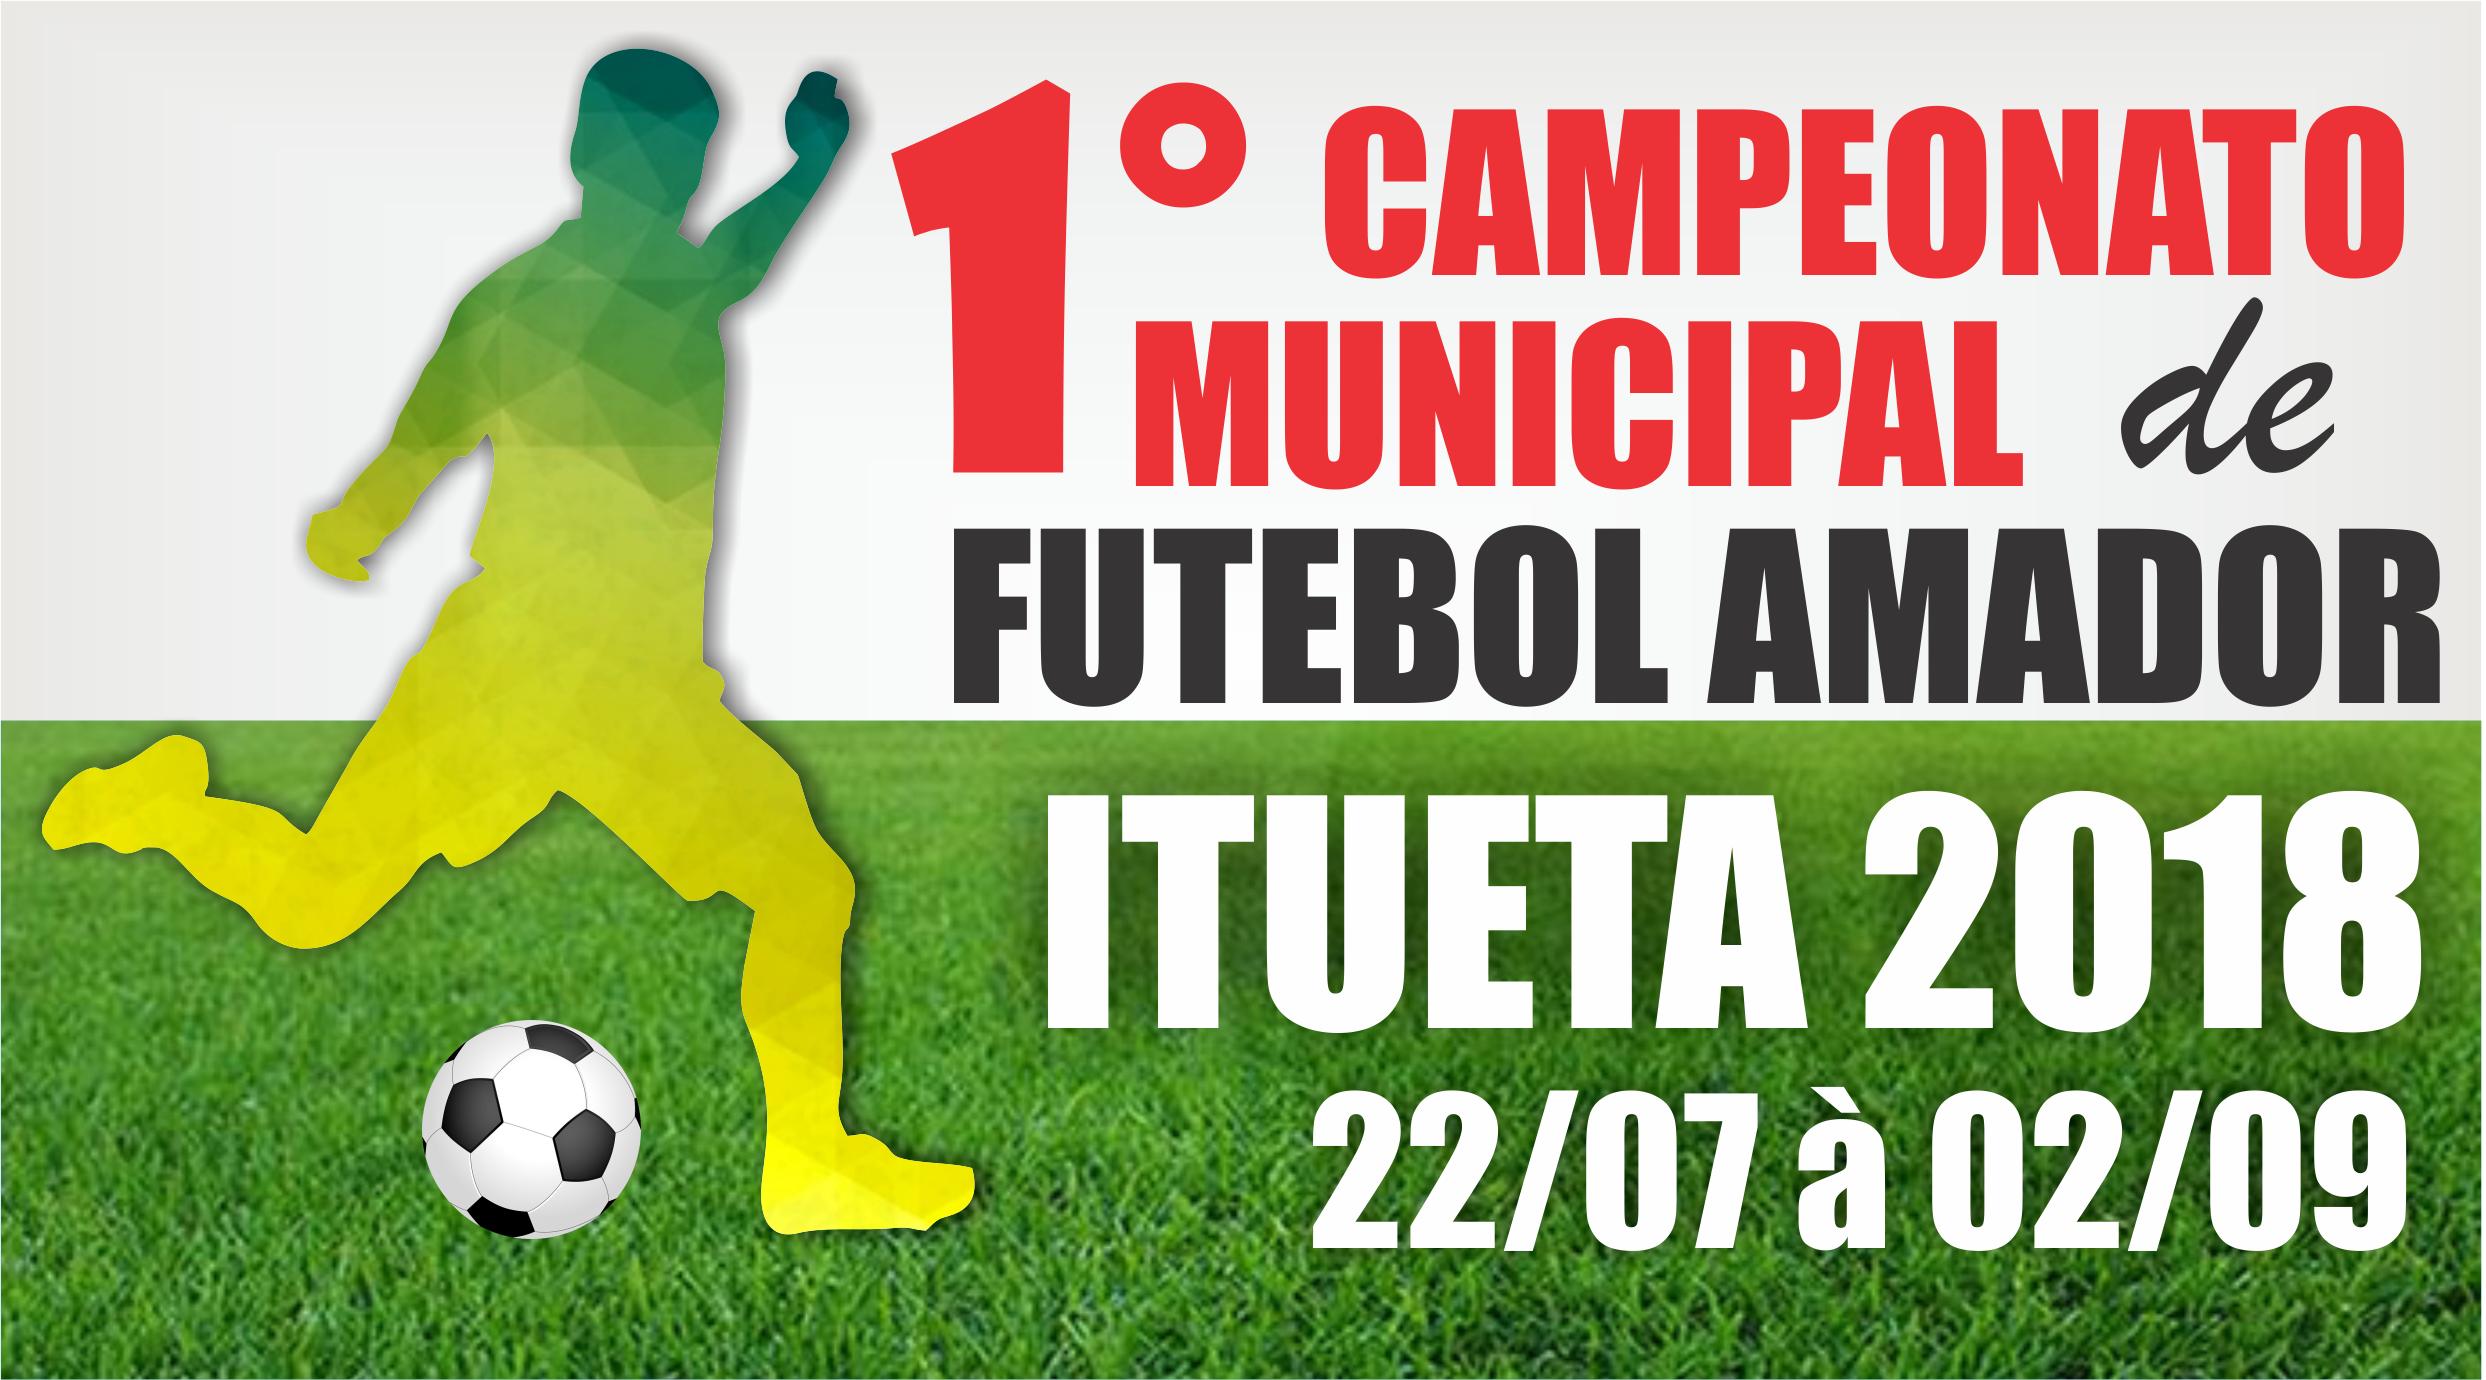 Campeonato de Futebol Amador de Itueta